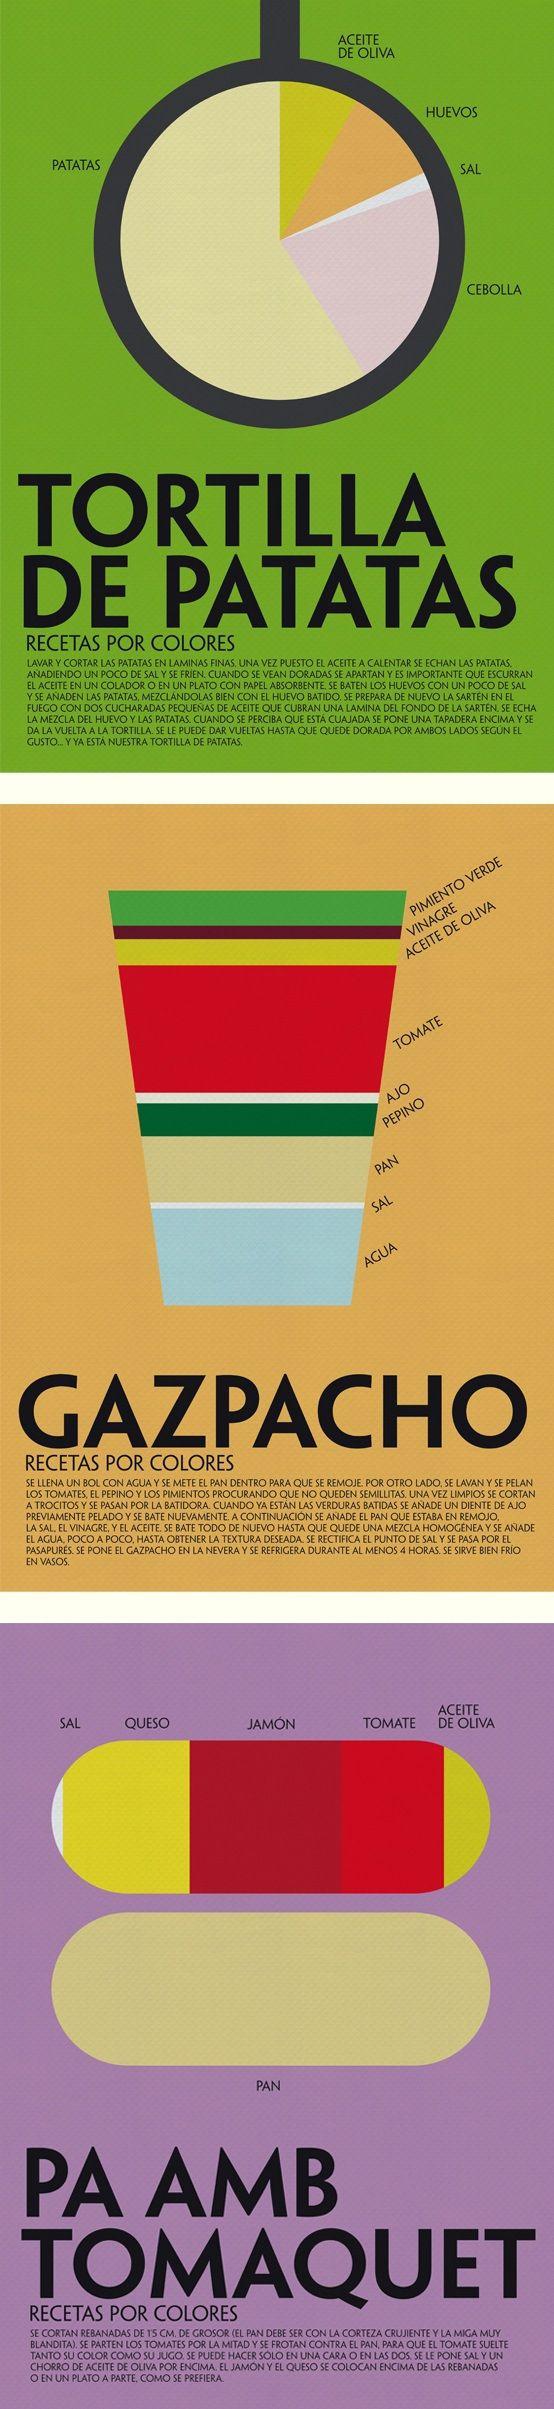 Tortilla de patata – Gazpacho – Pan con tomate: recetas por colores